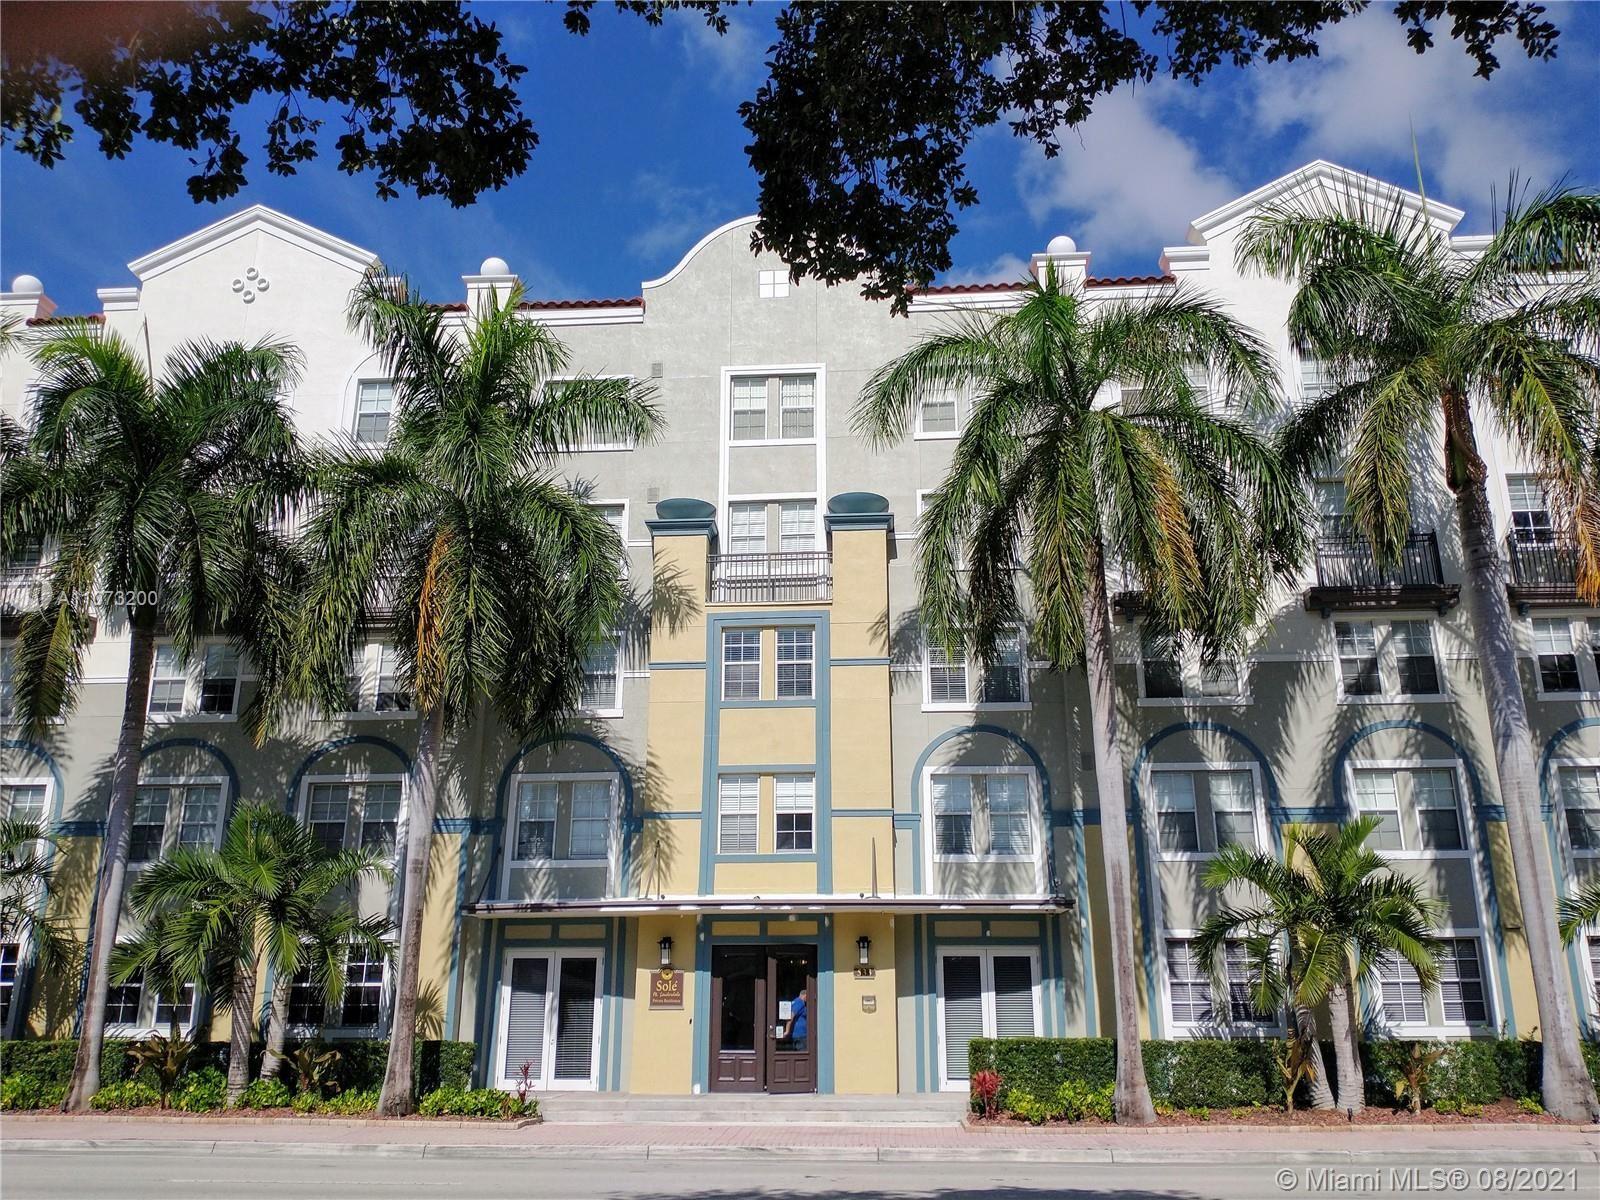 533 NE 3rd, Ave. #329, Fort Lauderdale, FL 33301 - #: A11073200